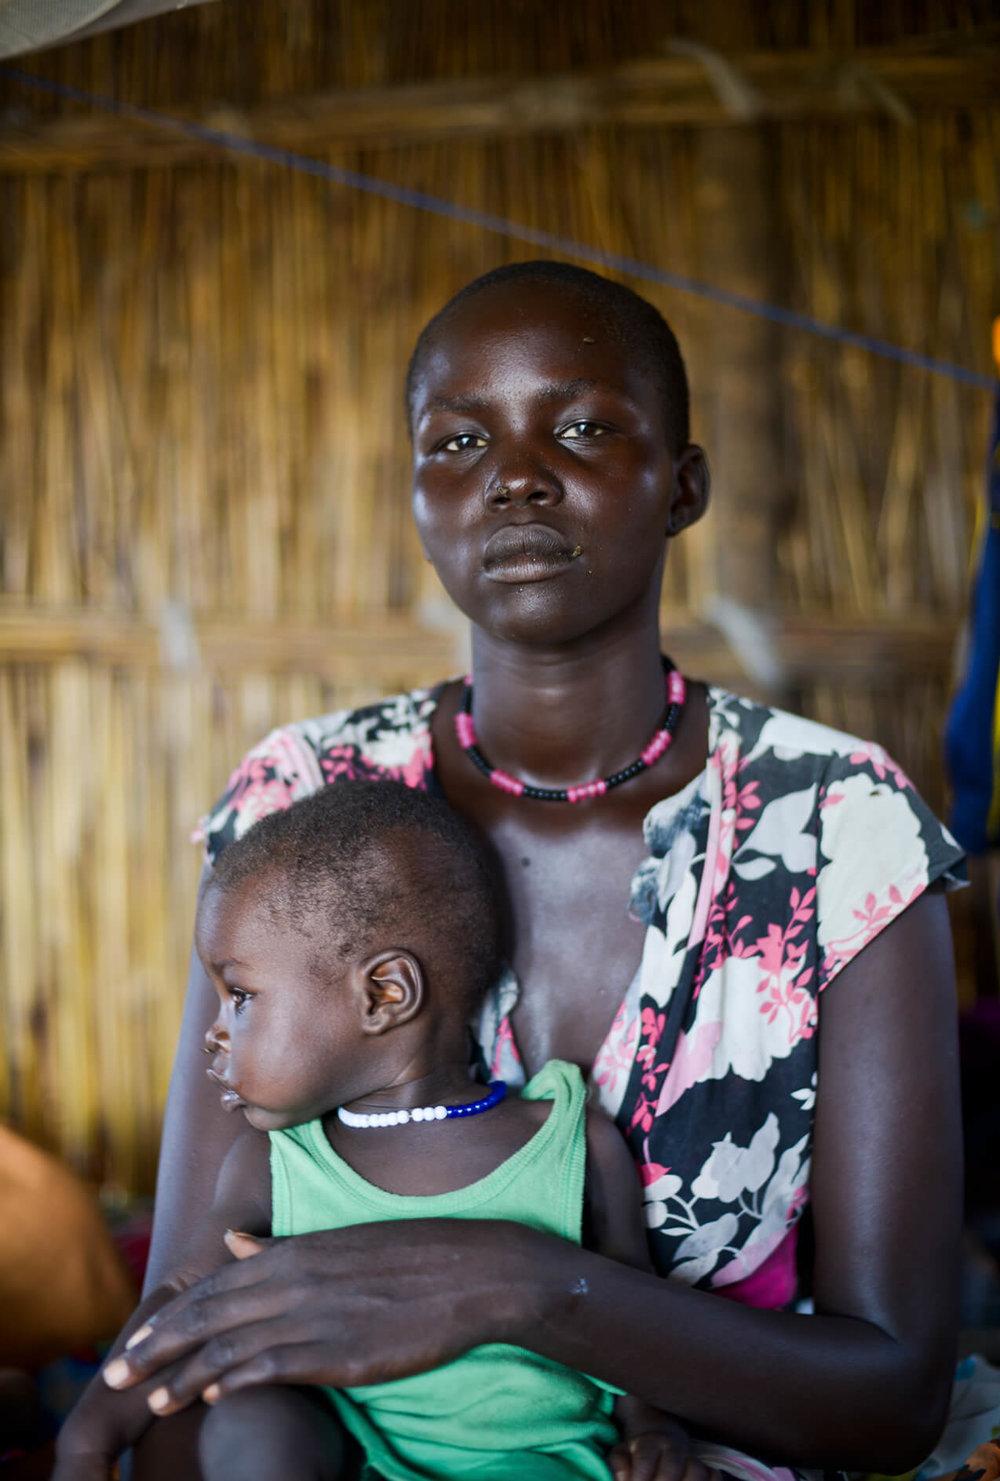 samer-muscati-south-sudan-5808.jpg